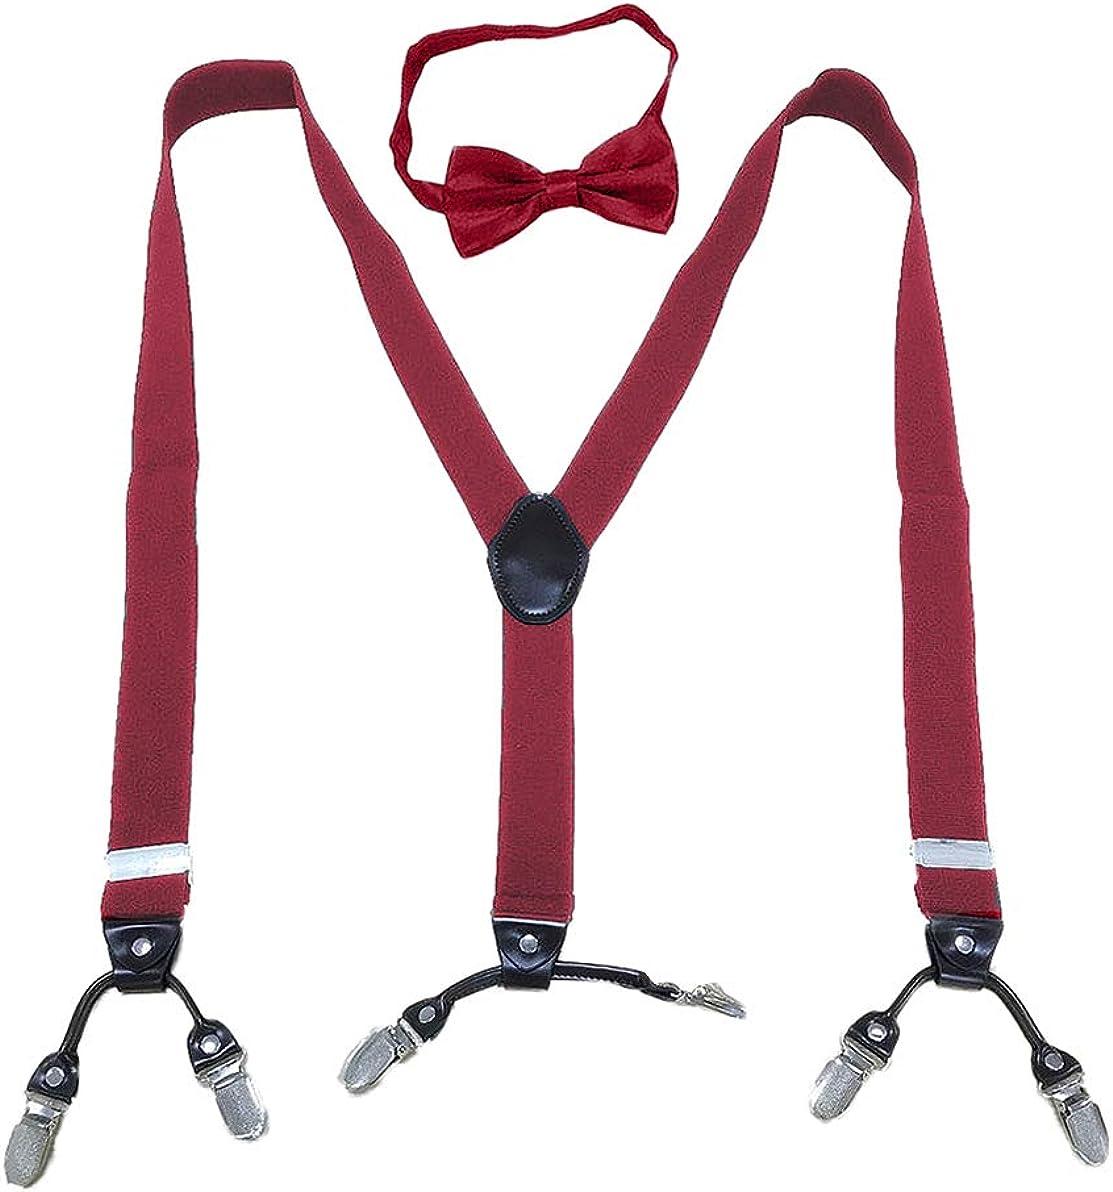 Men's Braces and Bow Tie Set - Fashion Adjustable 6 Clips Suspenders for Boyfriend, Husband, Dad